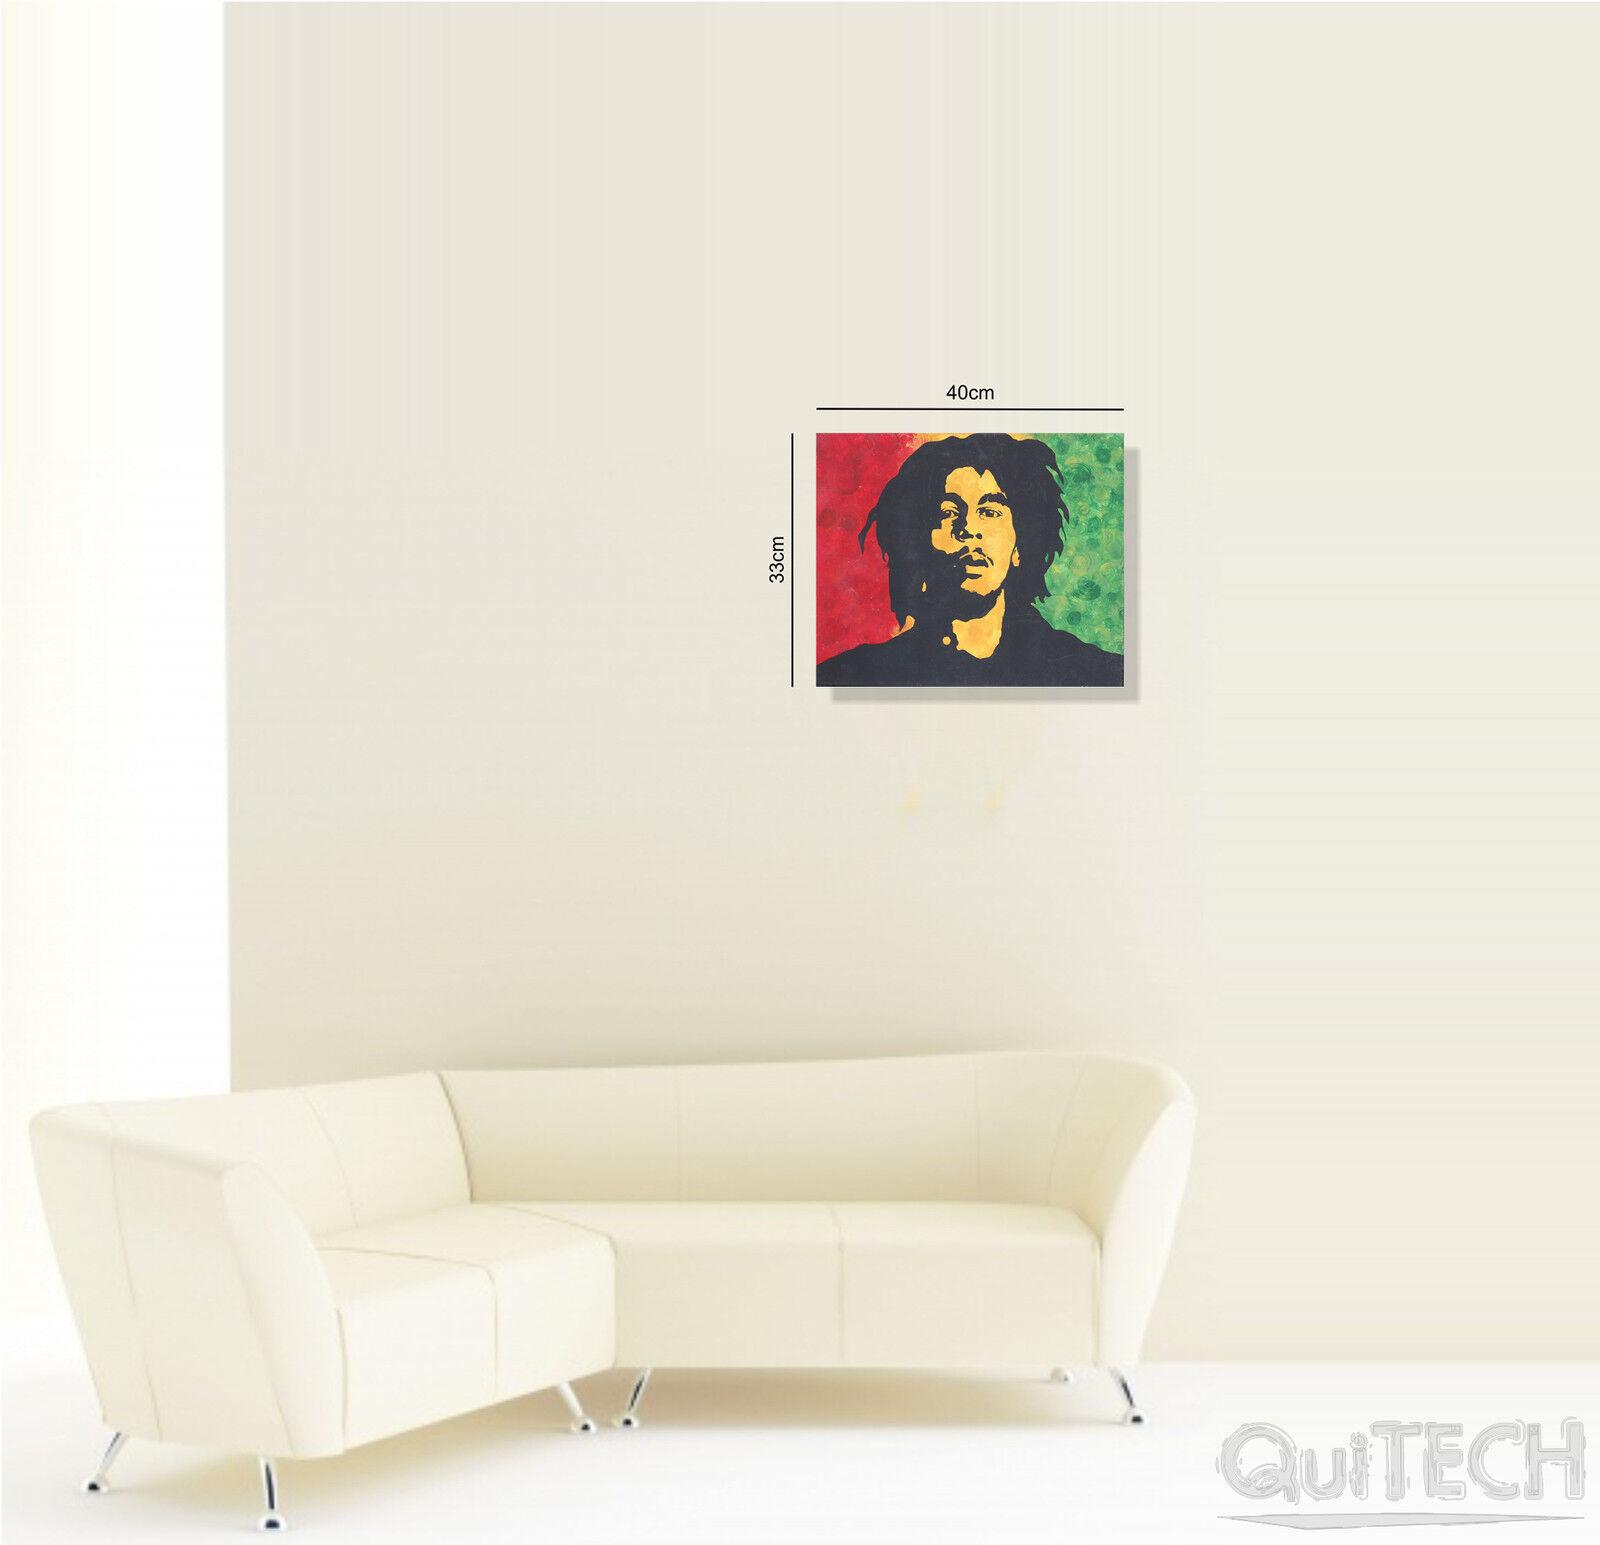 Bob Marley su - 11 - Quadro stampa su Marley Tela Pelle Canvas Dipinto Arte Moderna fa2a08